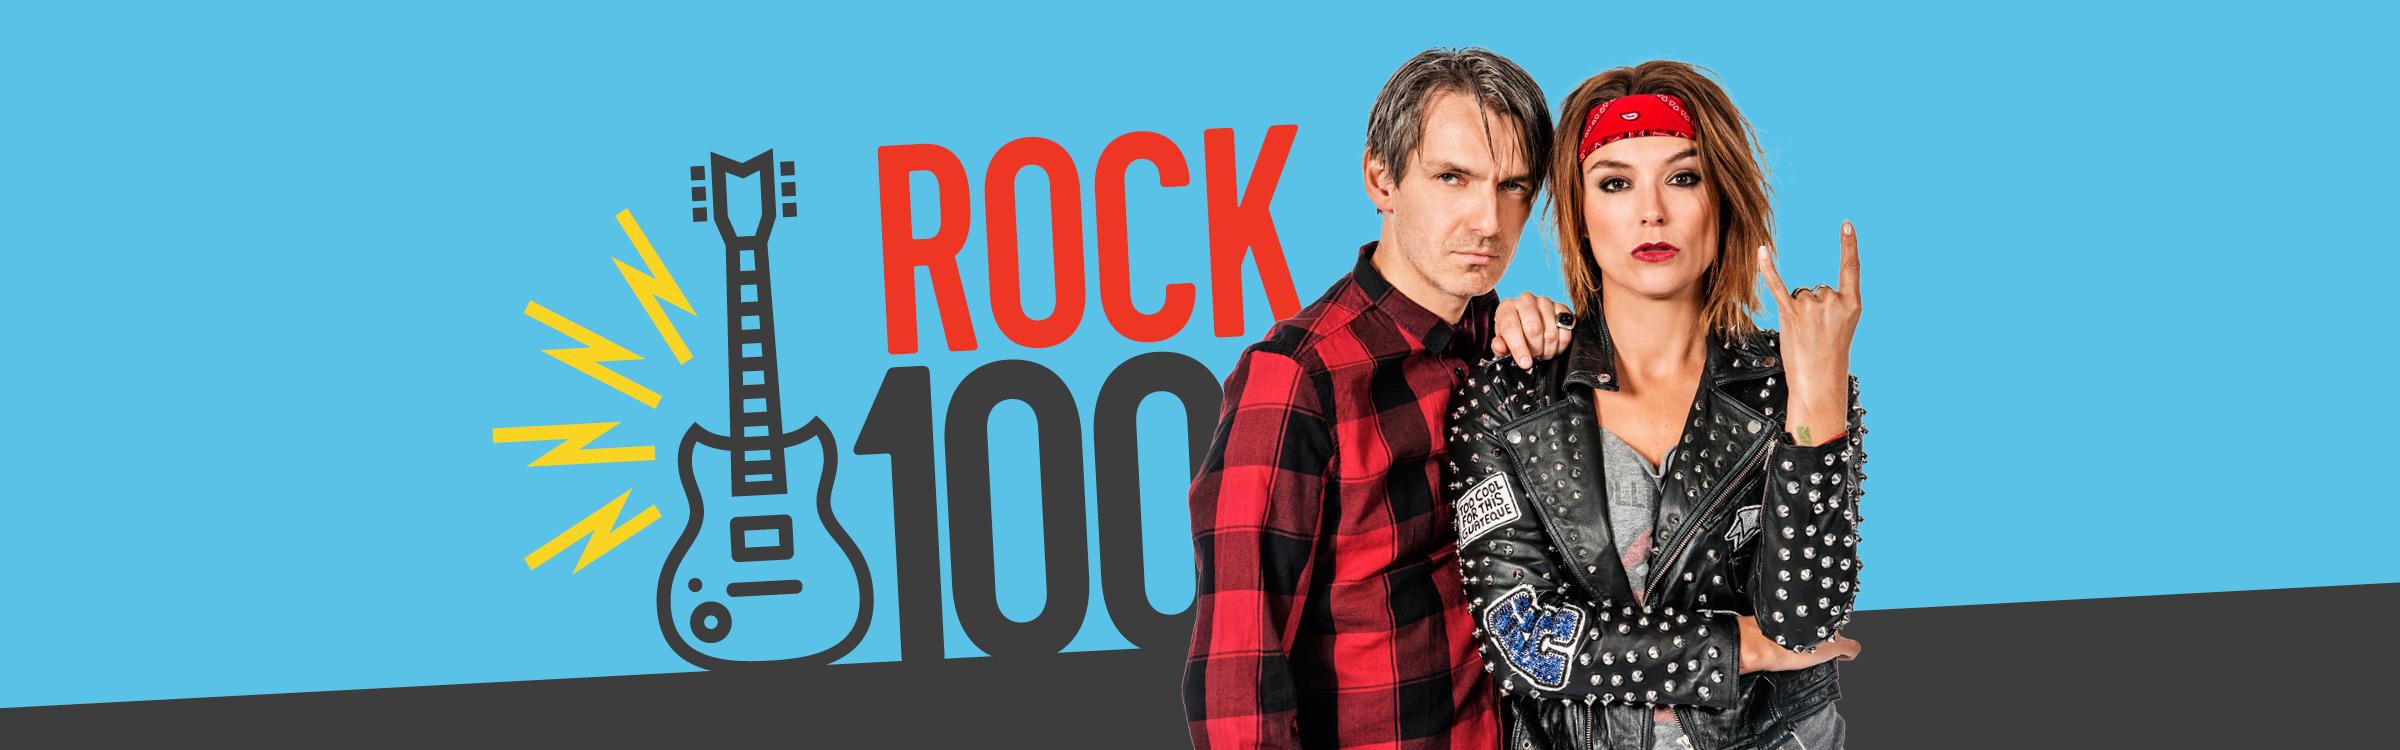 Rock100 header 1350x750